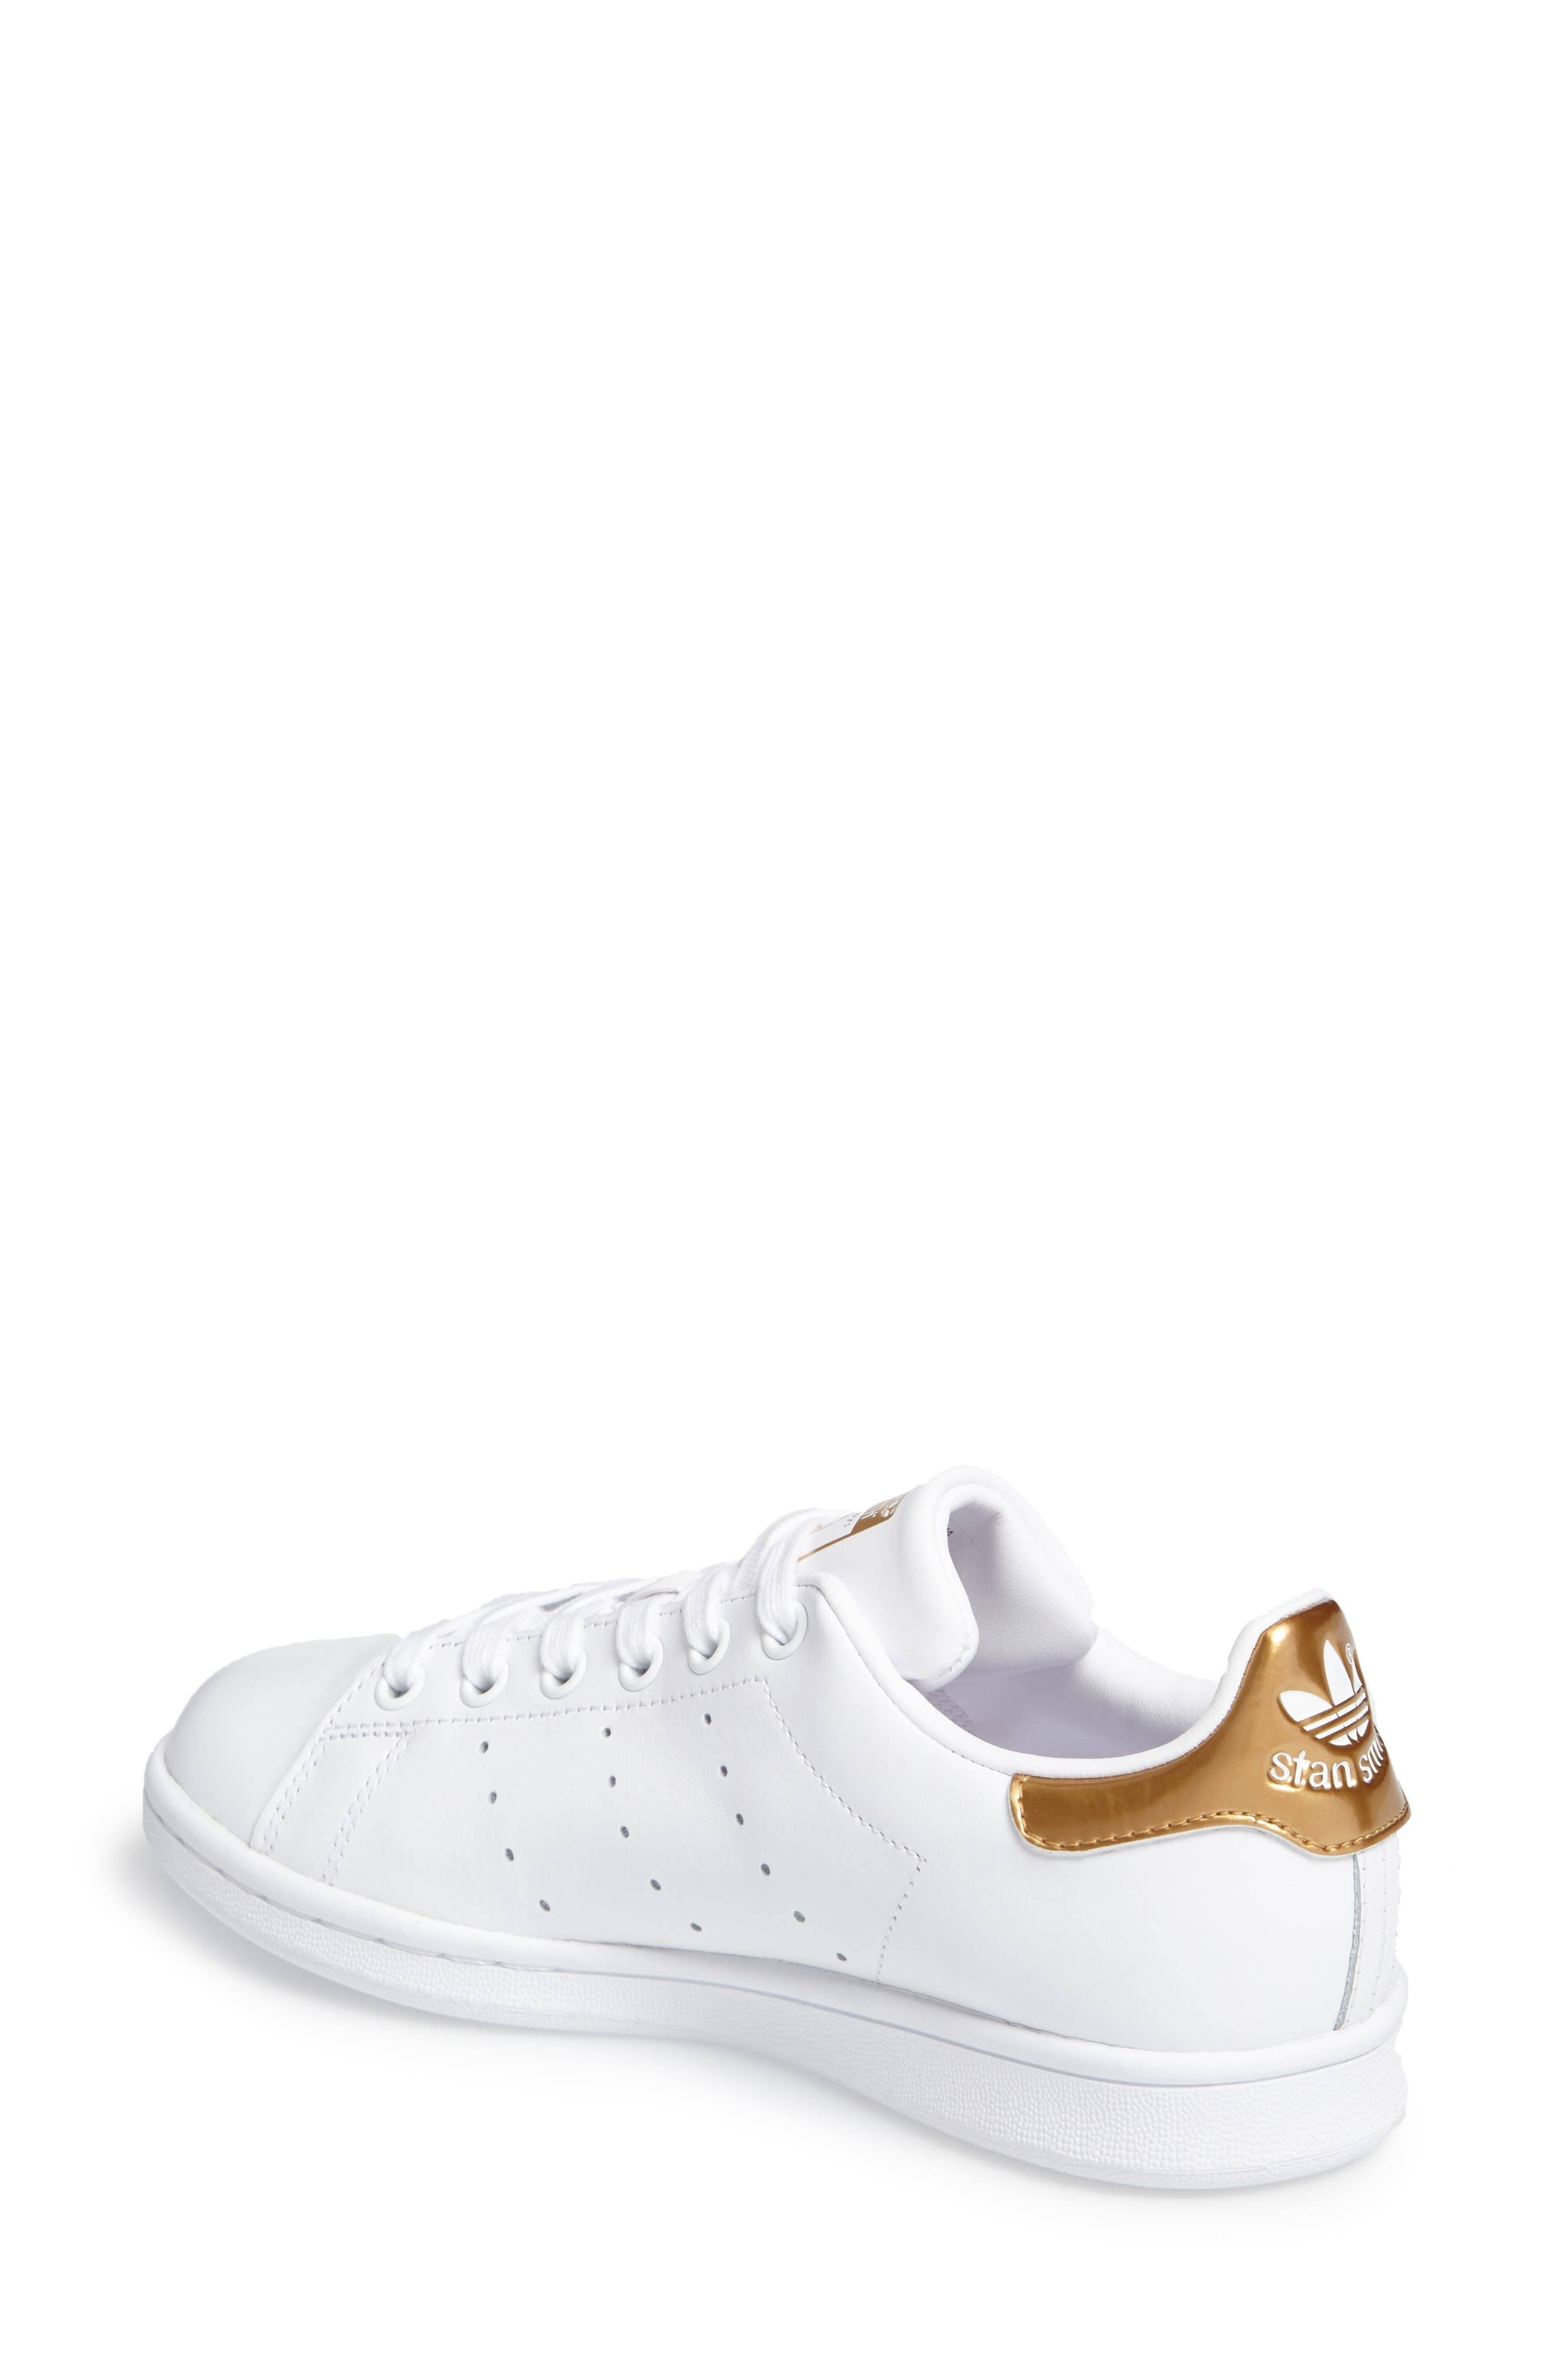 'Stan Smith' Sneaker,                             Alternate thumbnail 30, color,